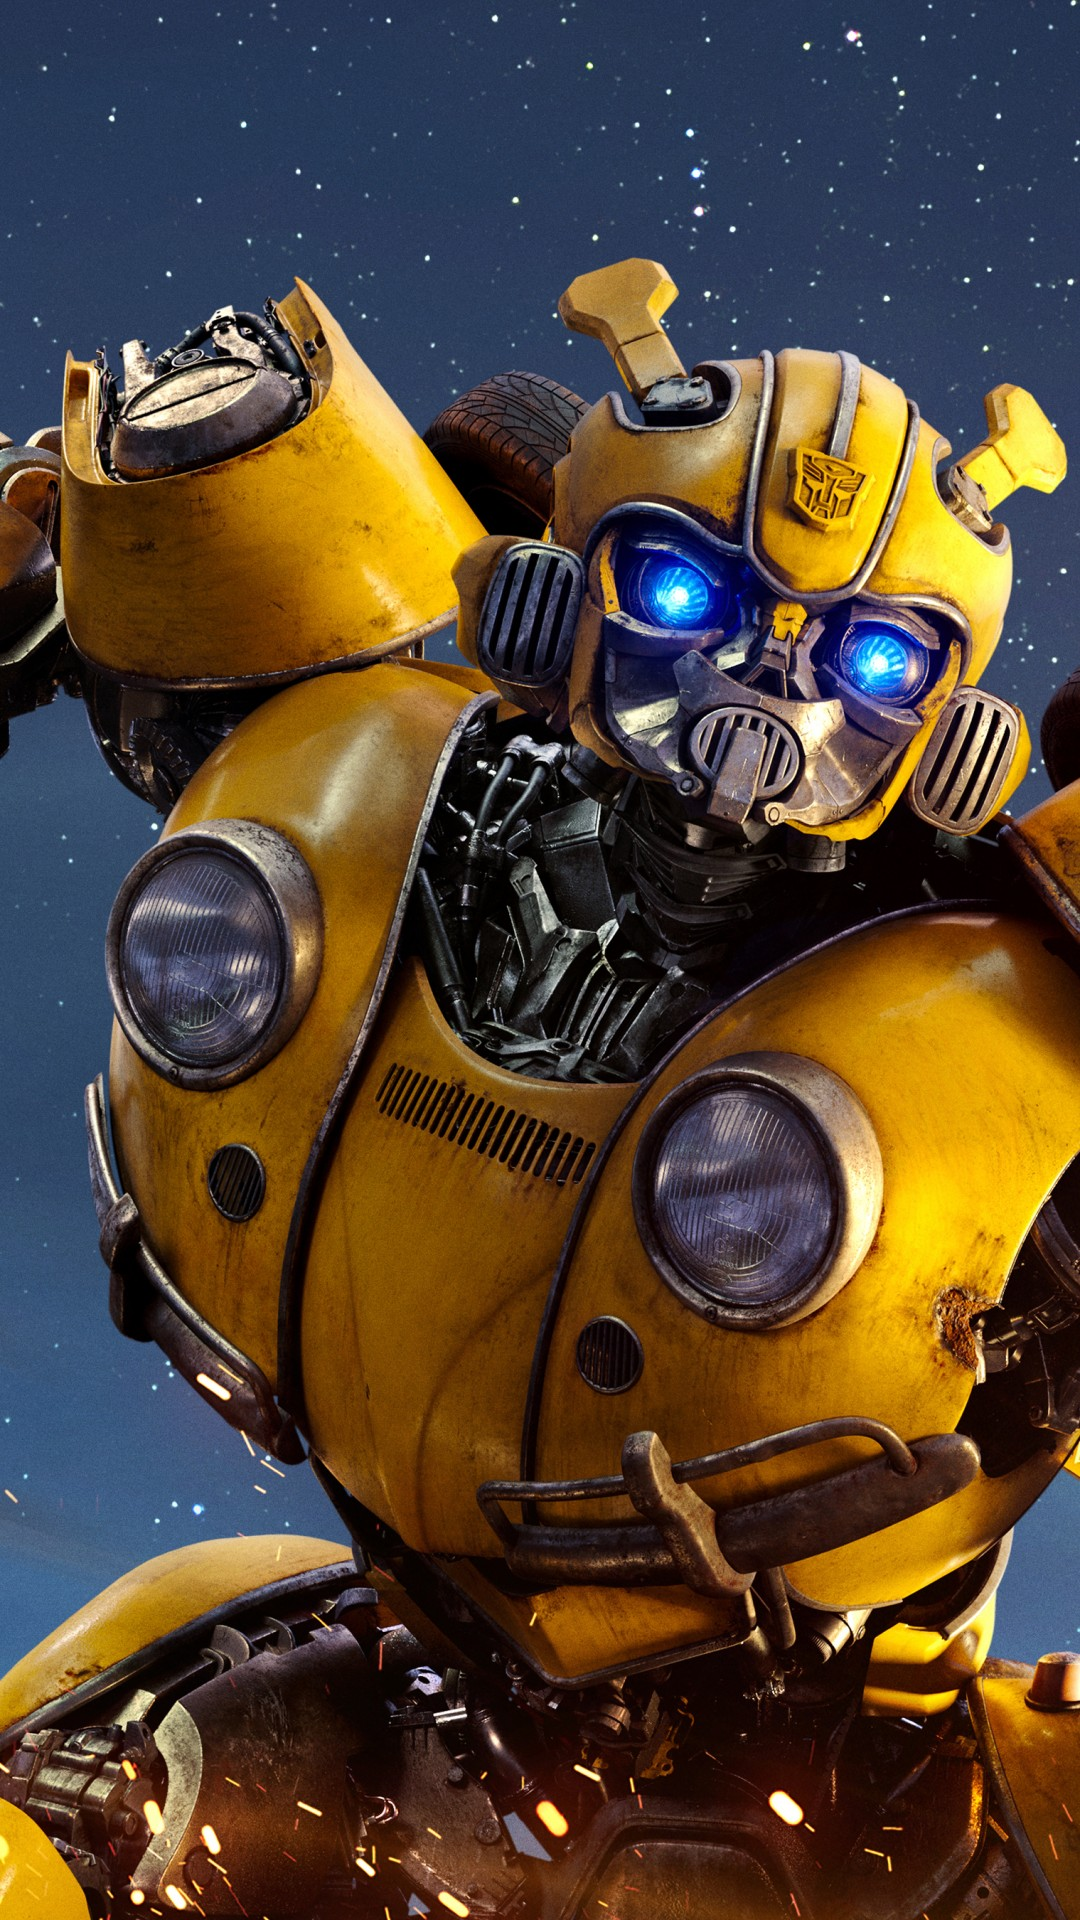 Wallpaper Transformers: Bumblebee, poster, 4K, Movies #20945